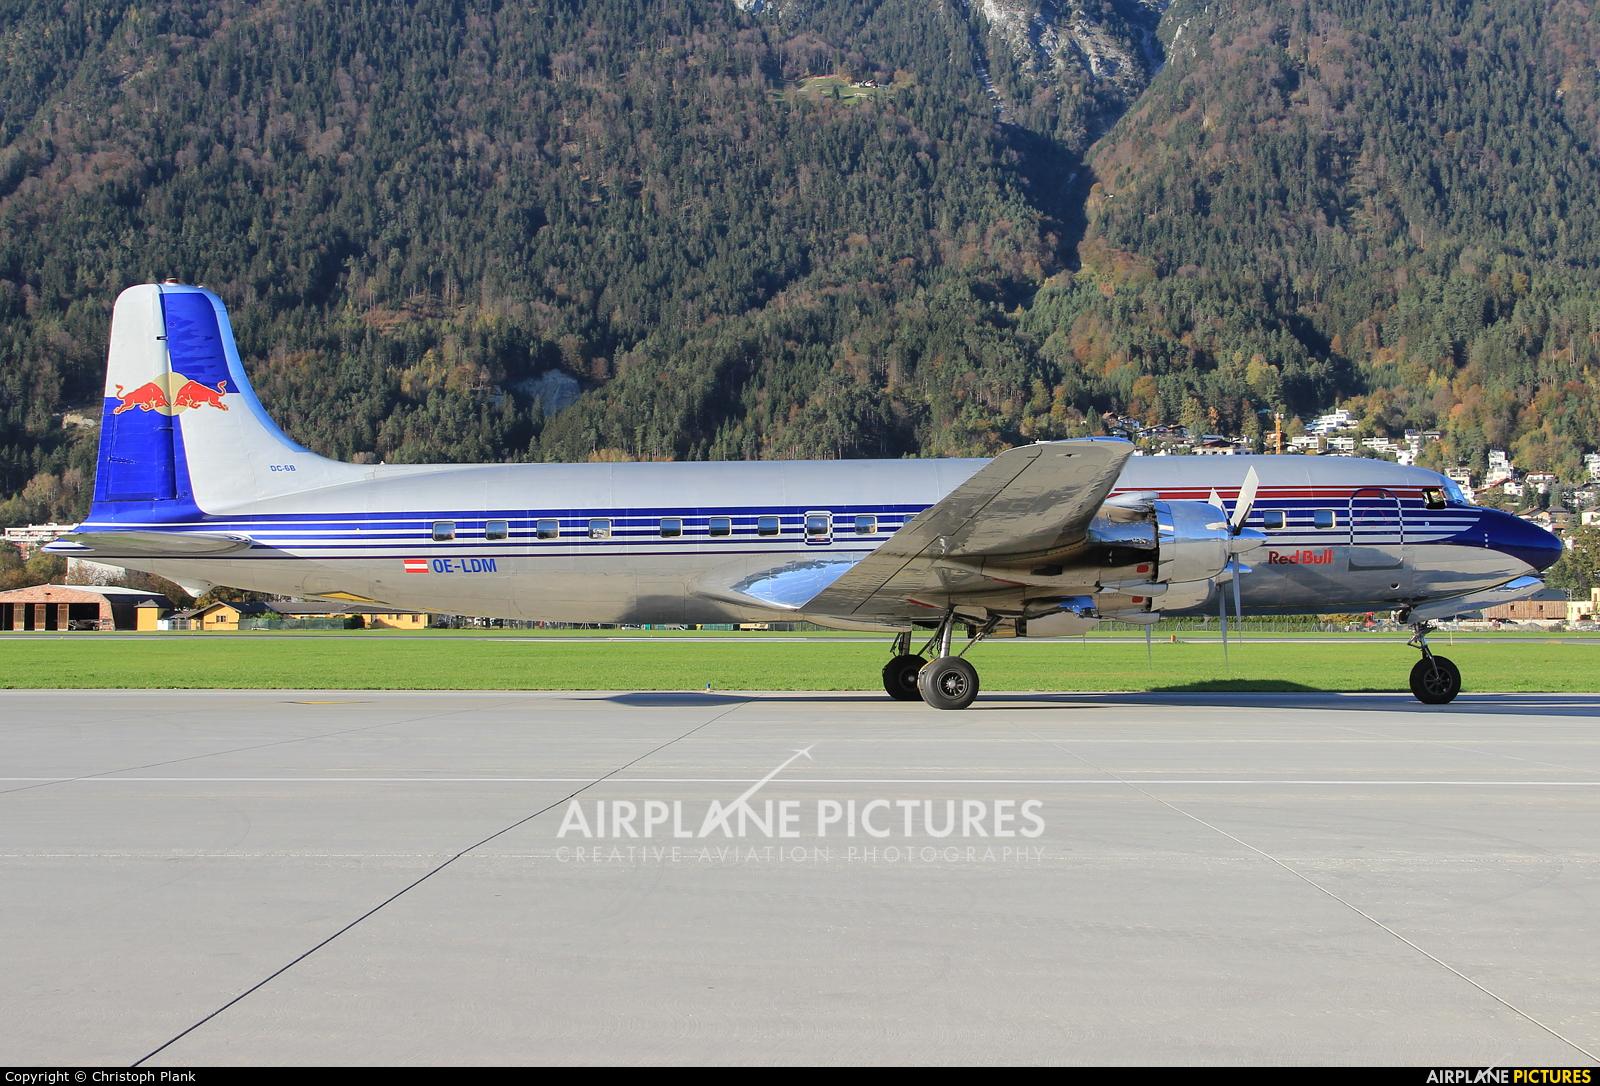 Red Bull OE-LDM aircraft at Innsbruck